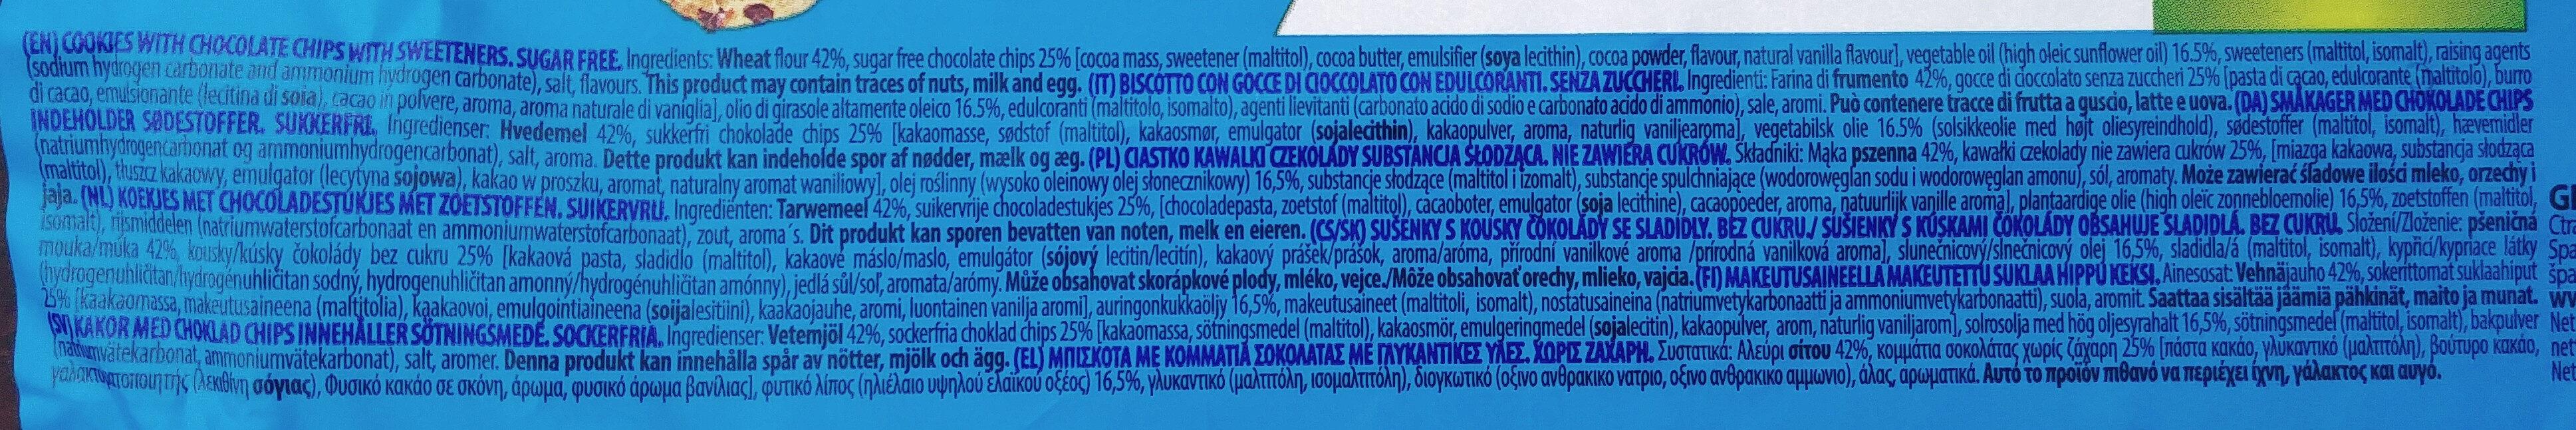 Sugar Free Choc Chip Cookies - Składniki - pl